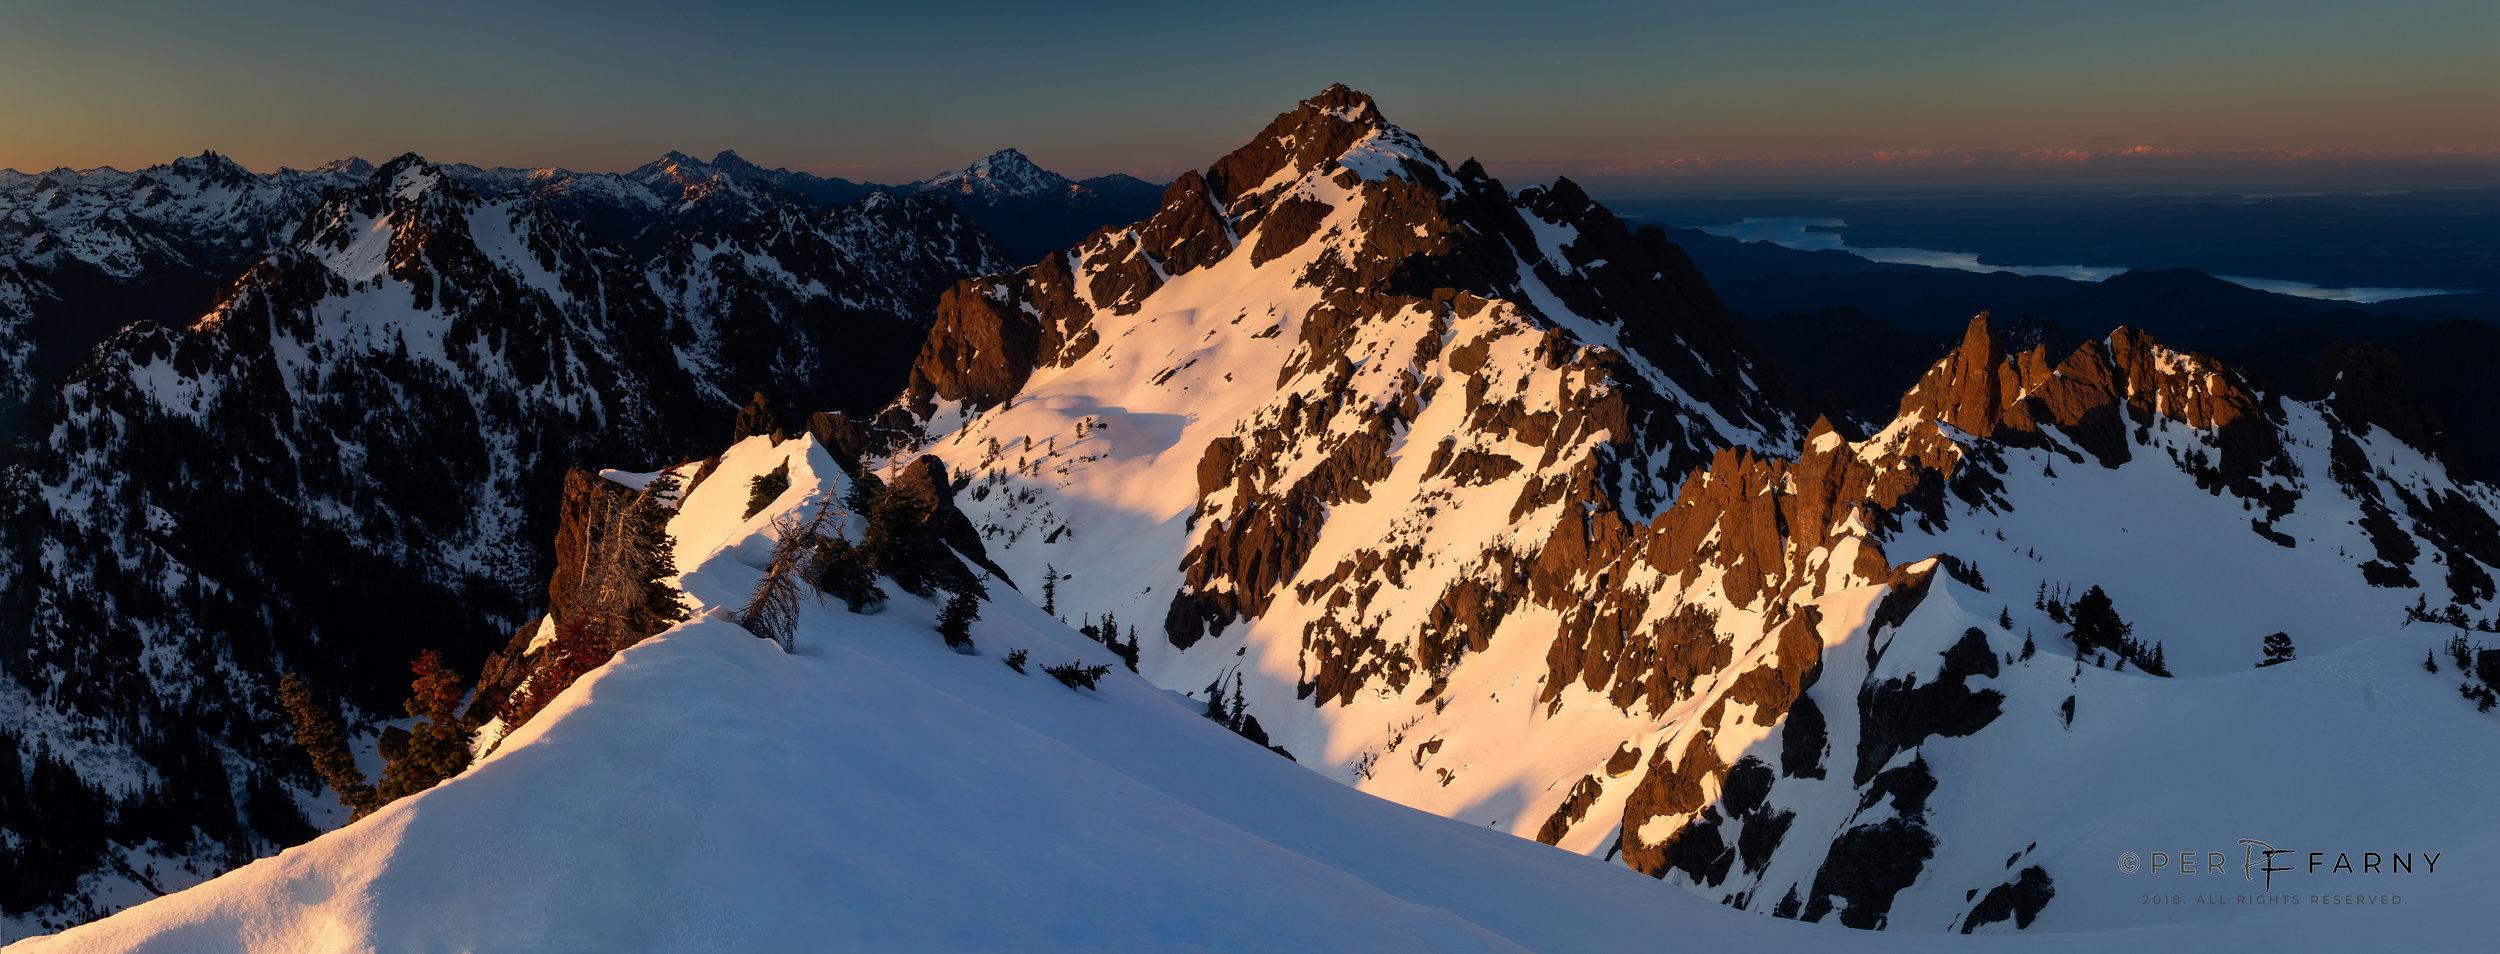 Mt. Washington